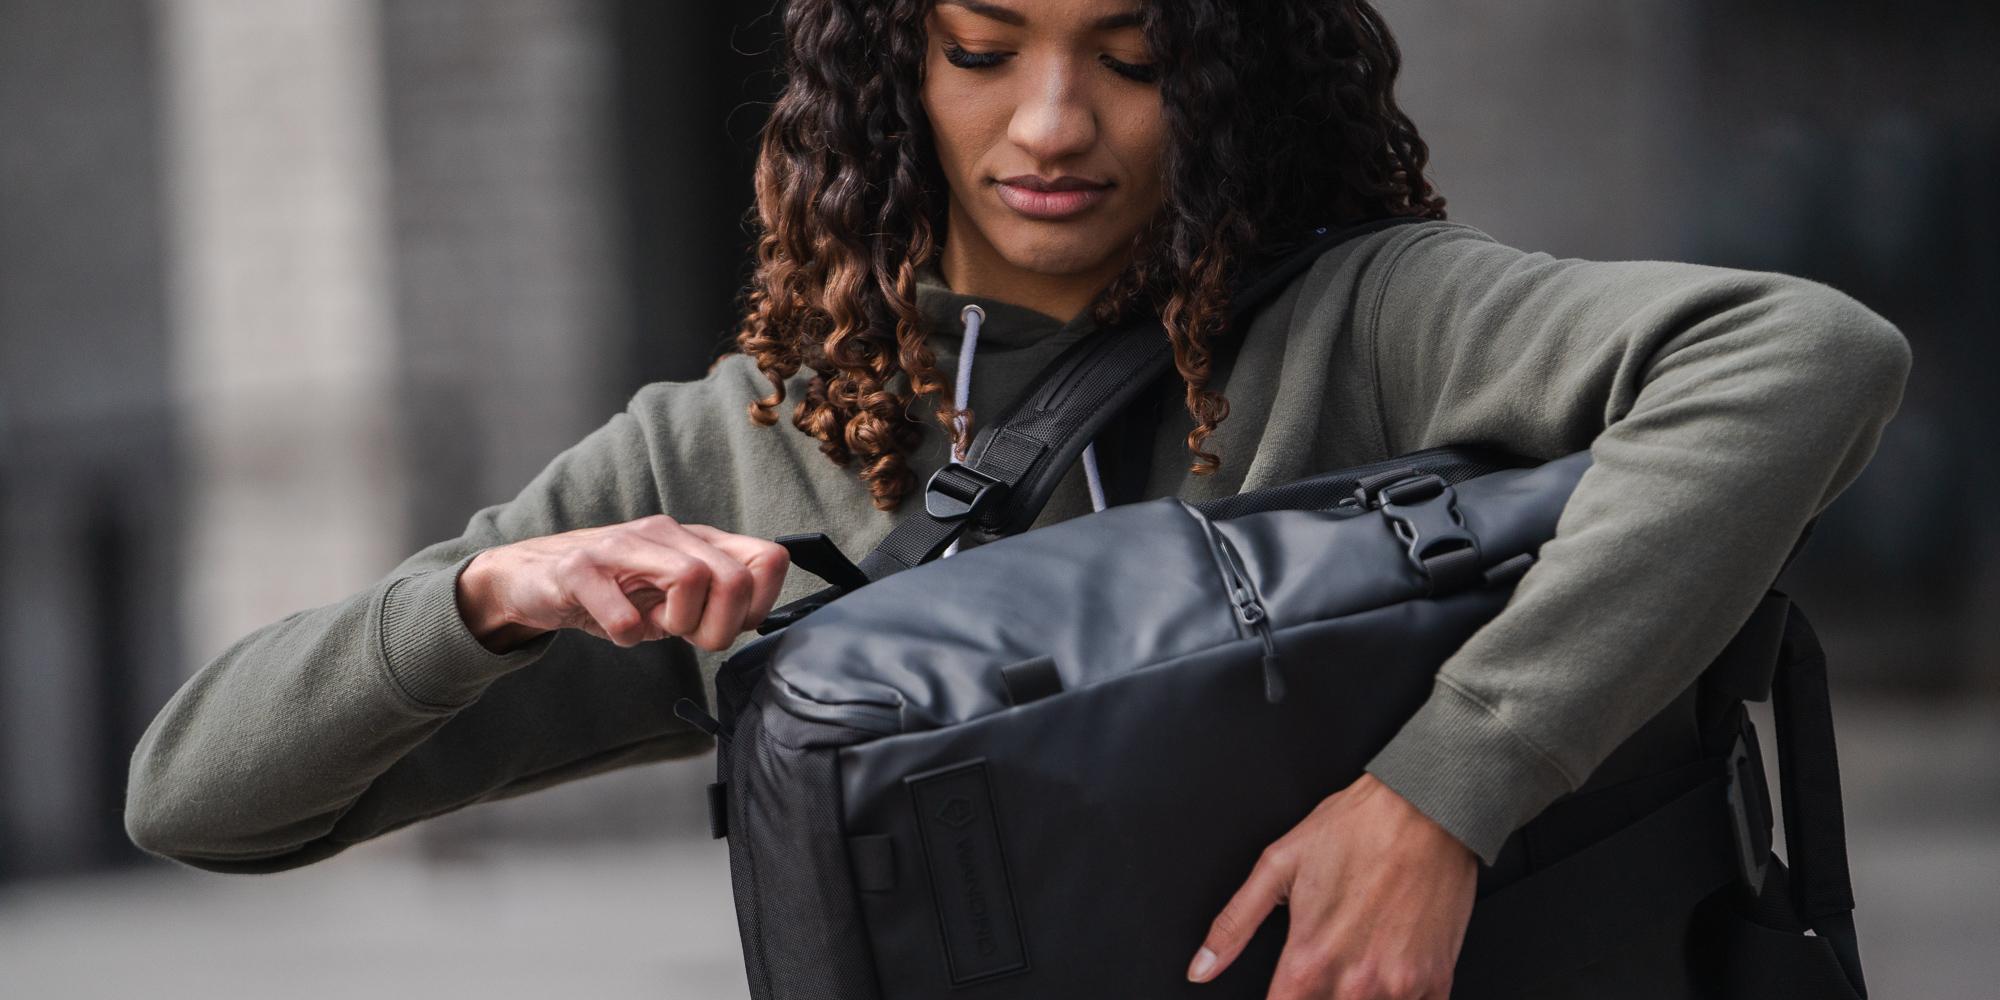 Wandrd All-new Prvke 21 Photo Bundle Essential Backpack - The Prvke Series just got even better!